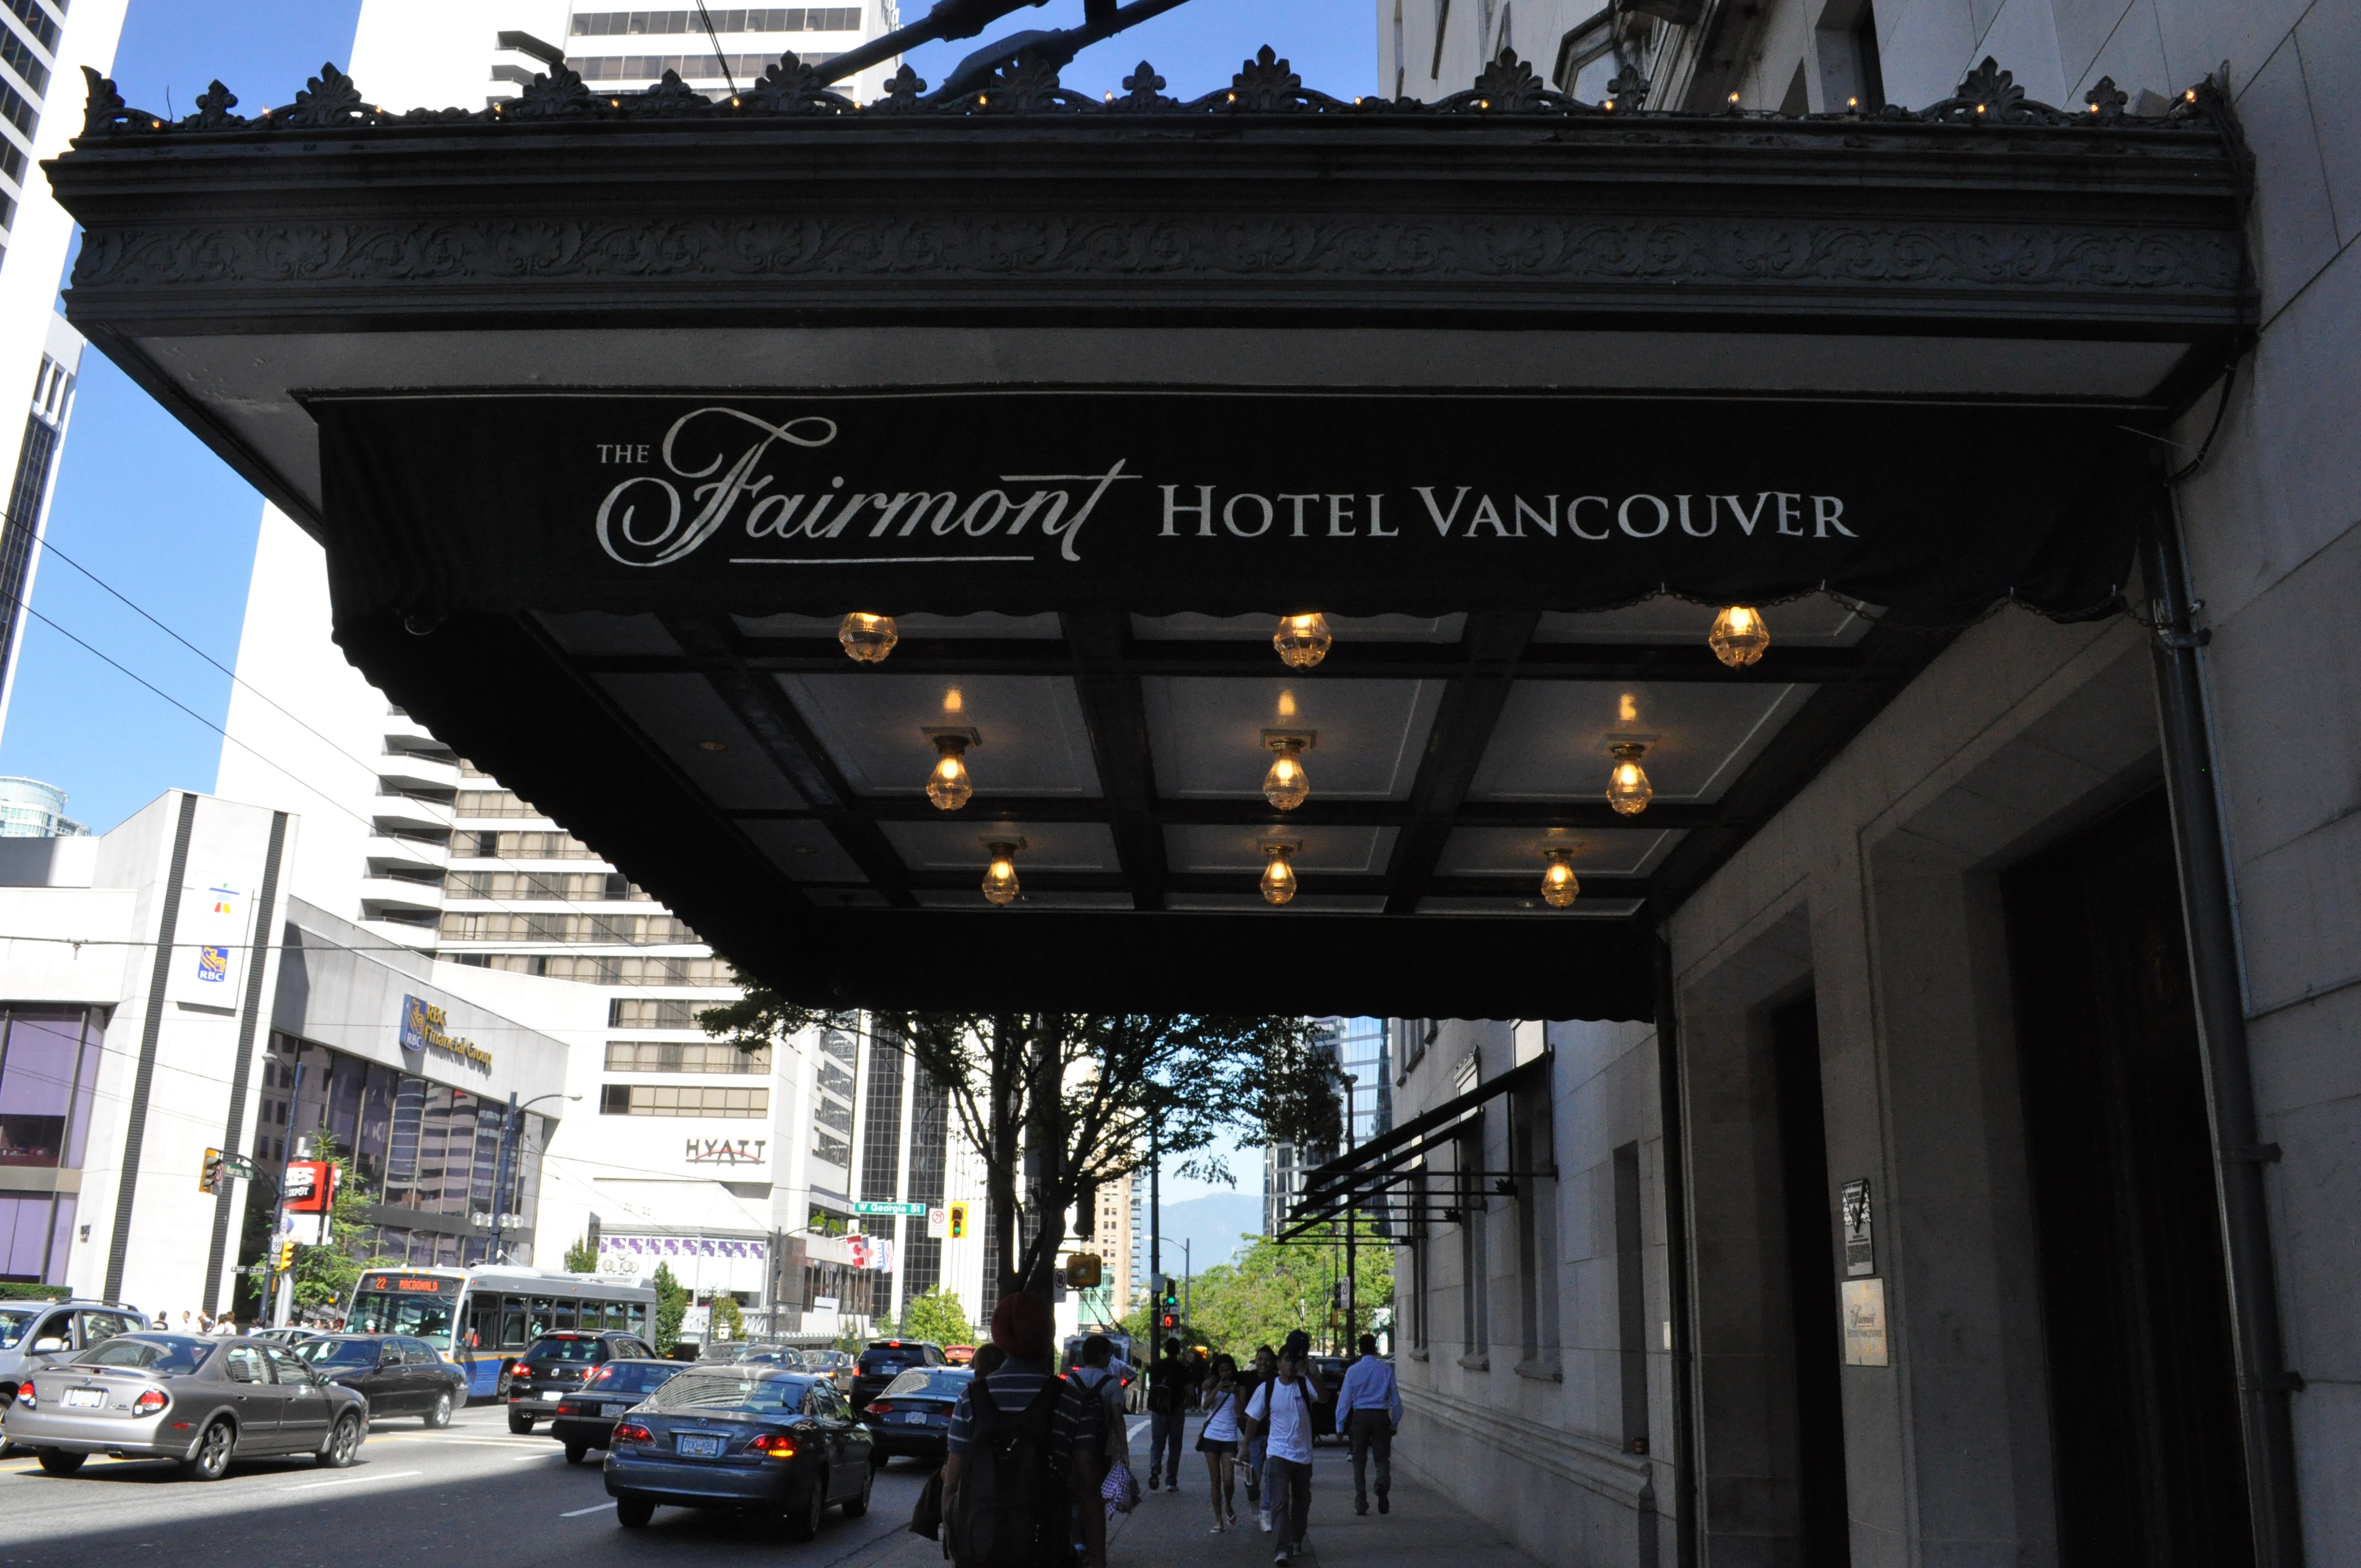 Burrard Street Hotel Vancouver